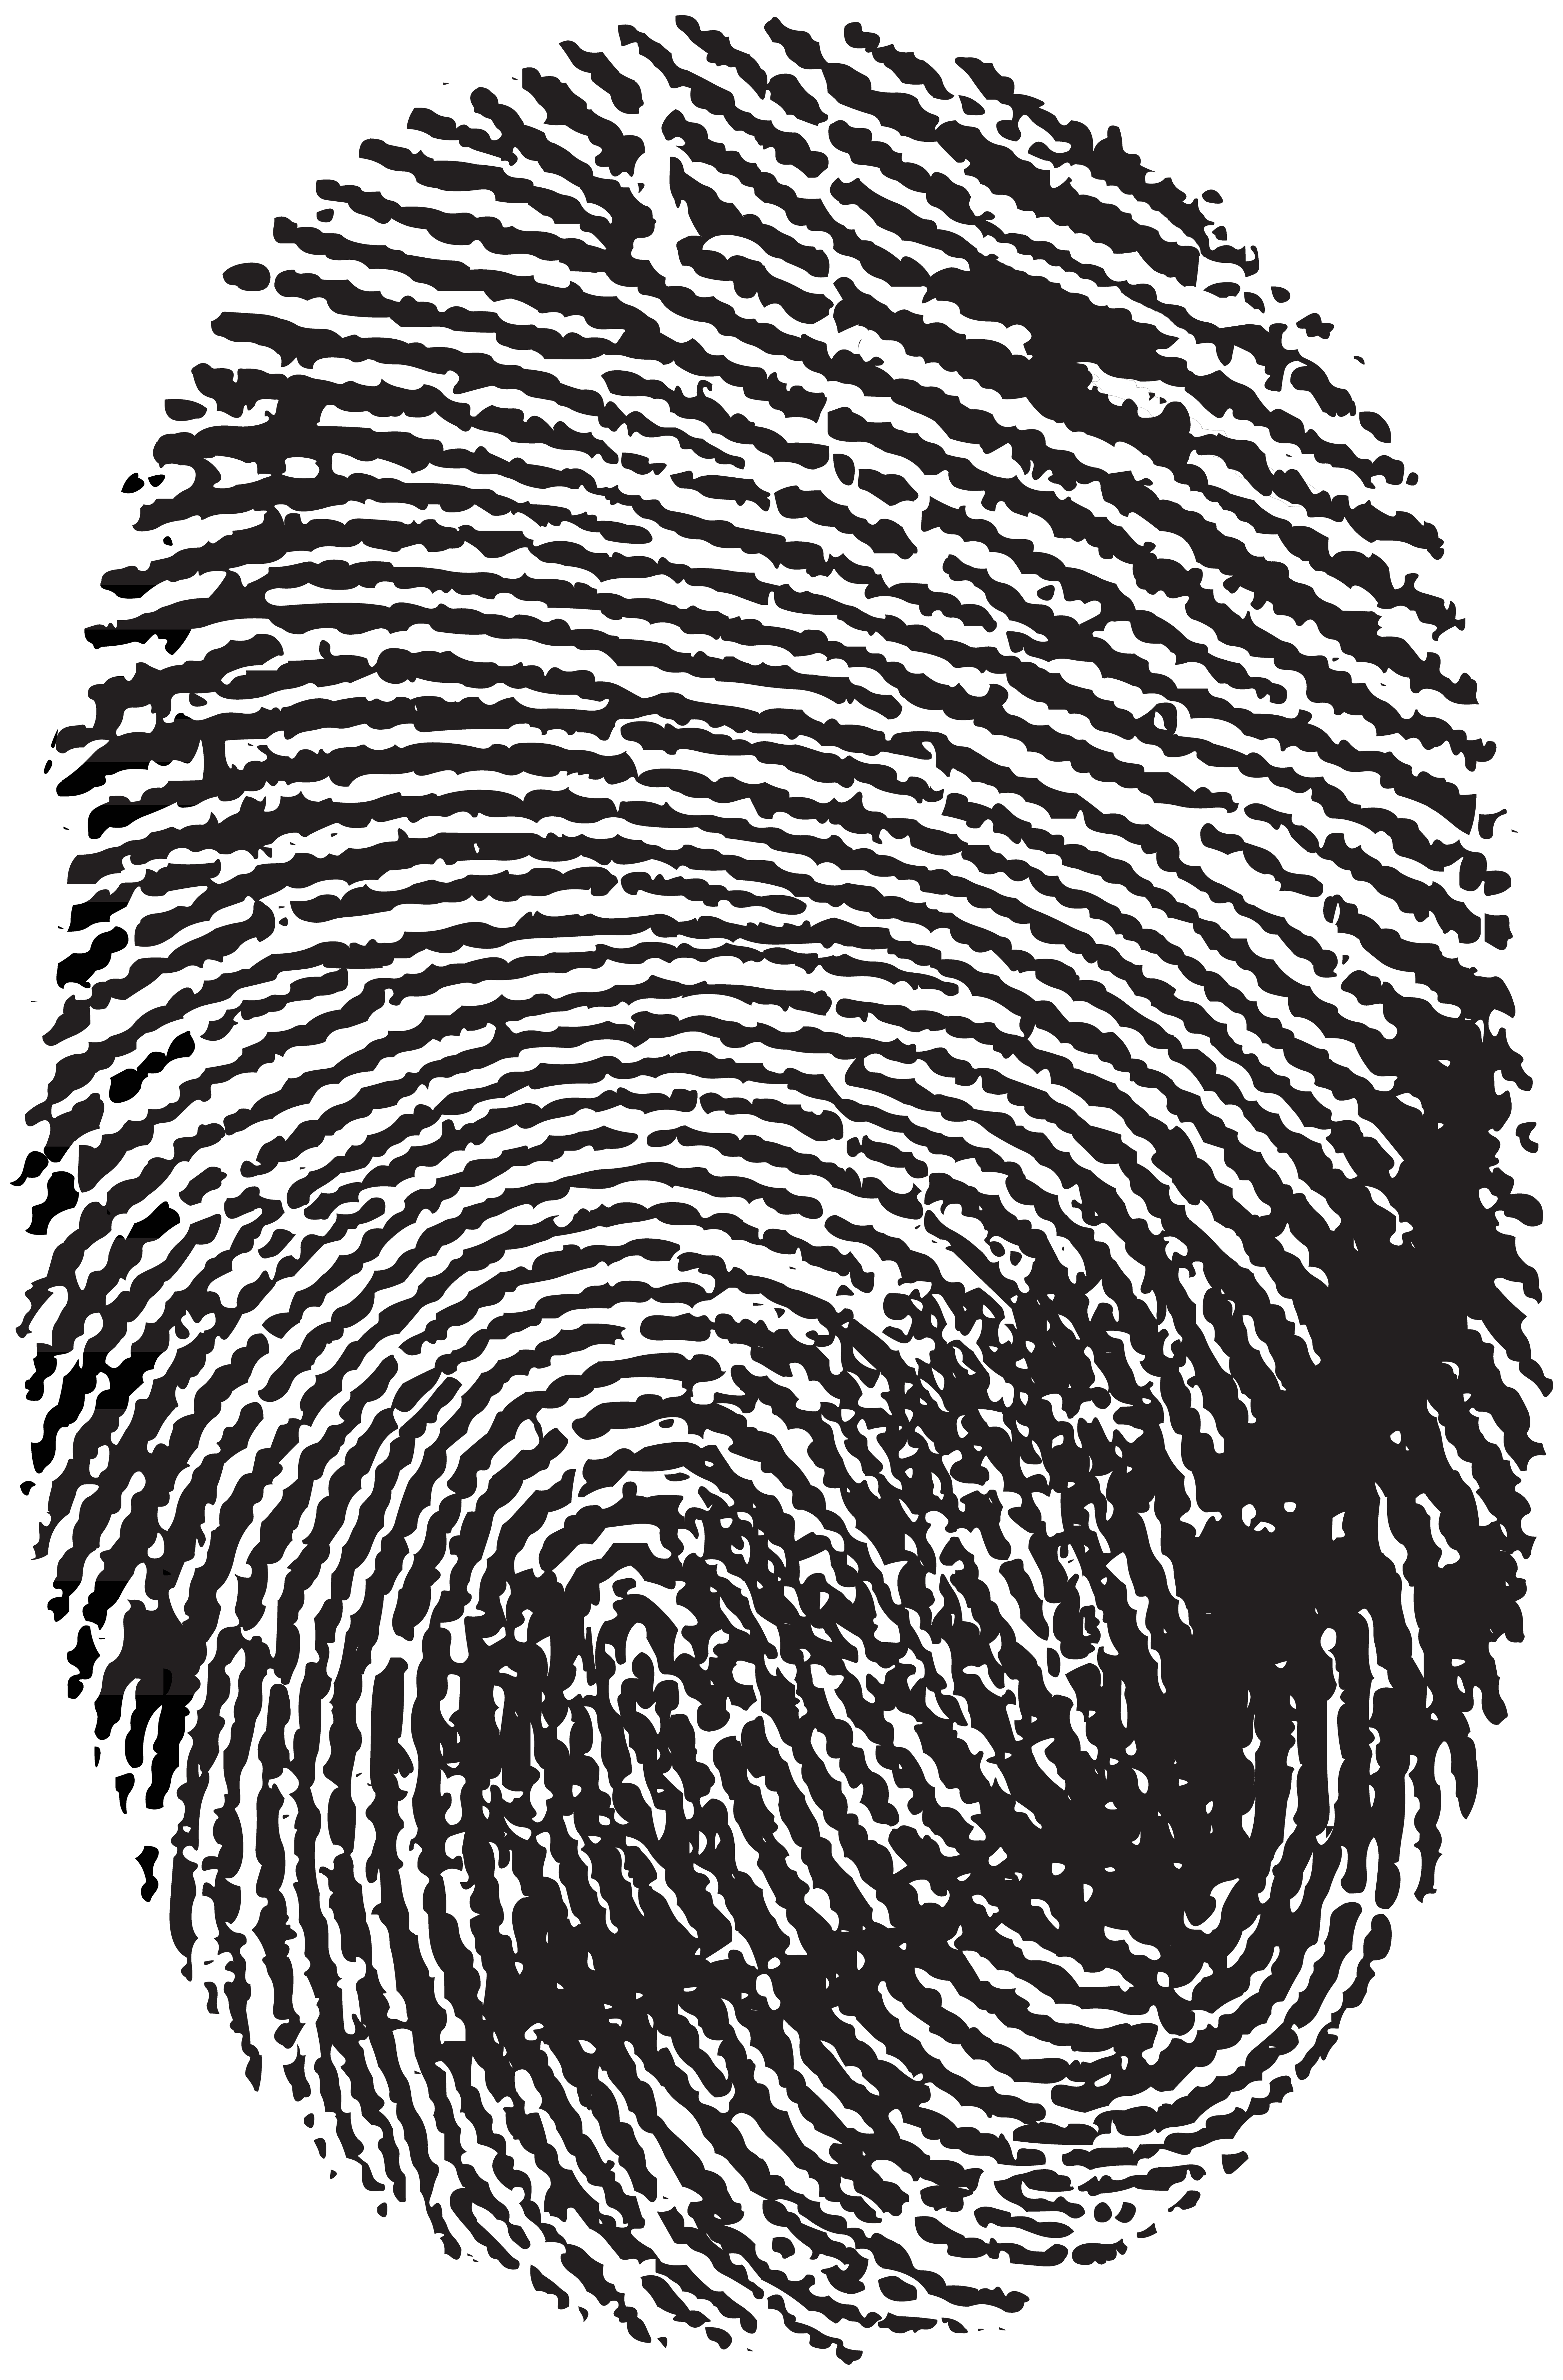 Finger print png fashion. Detective clipart fingerprint